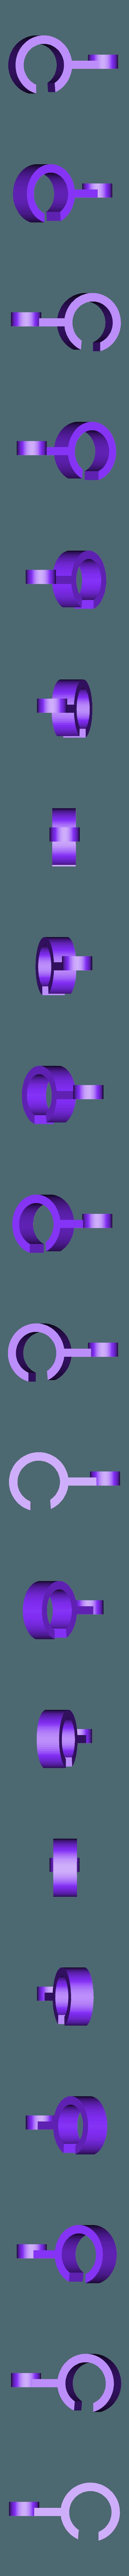 bobo.stl Download free STL file Small Humanoid Robot • 3D printable design, choimoni